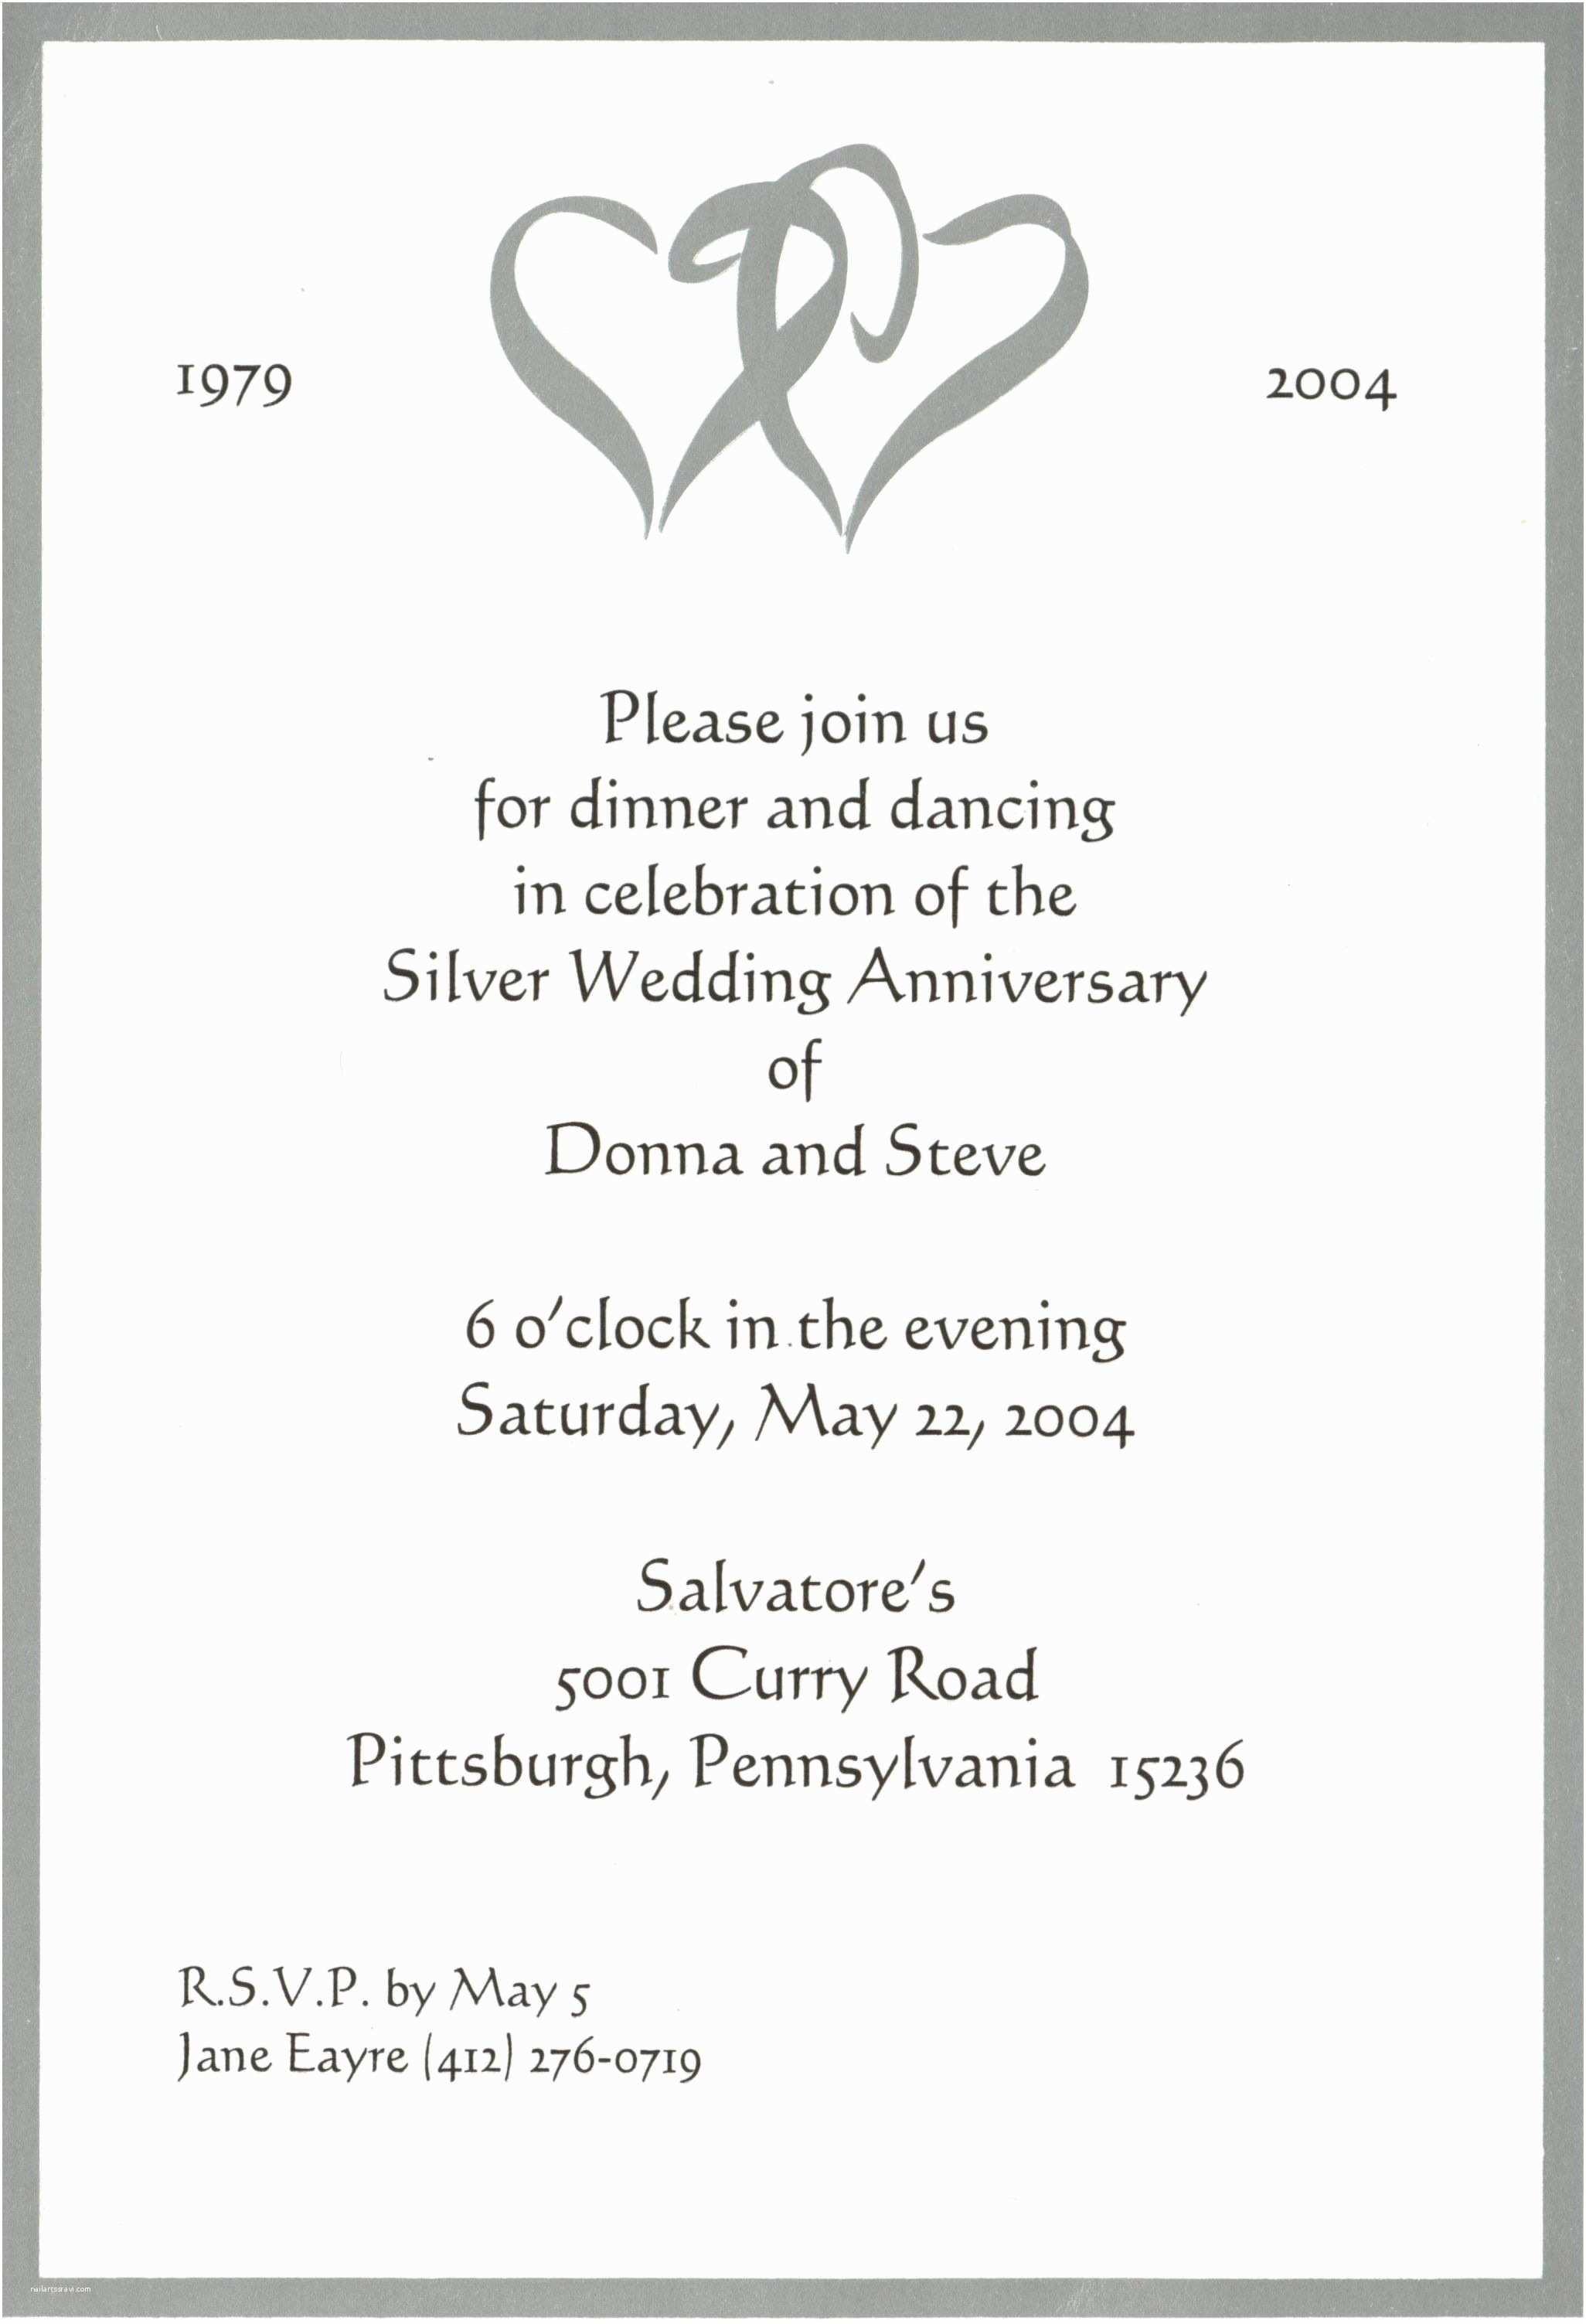 Wedding Invitation Wording for Friends Invitation Card Wording Invitation Card Wordings for